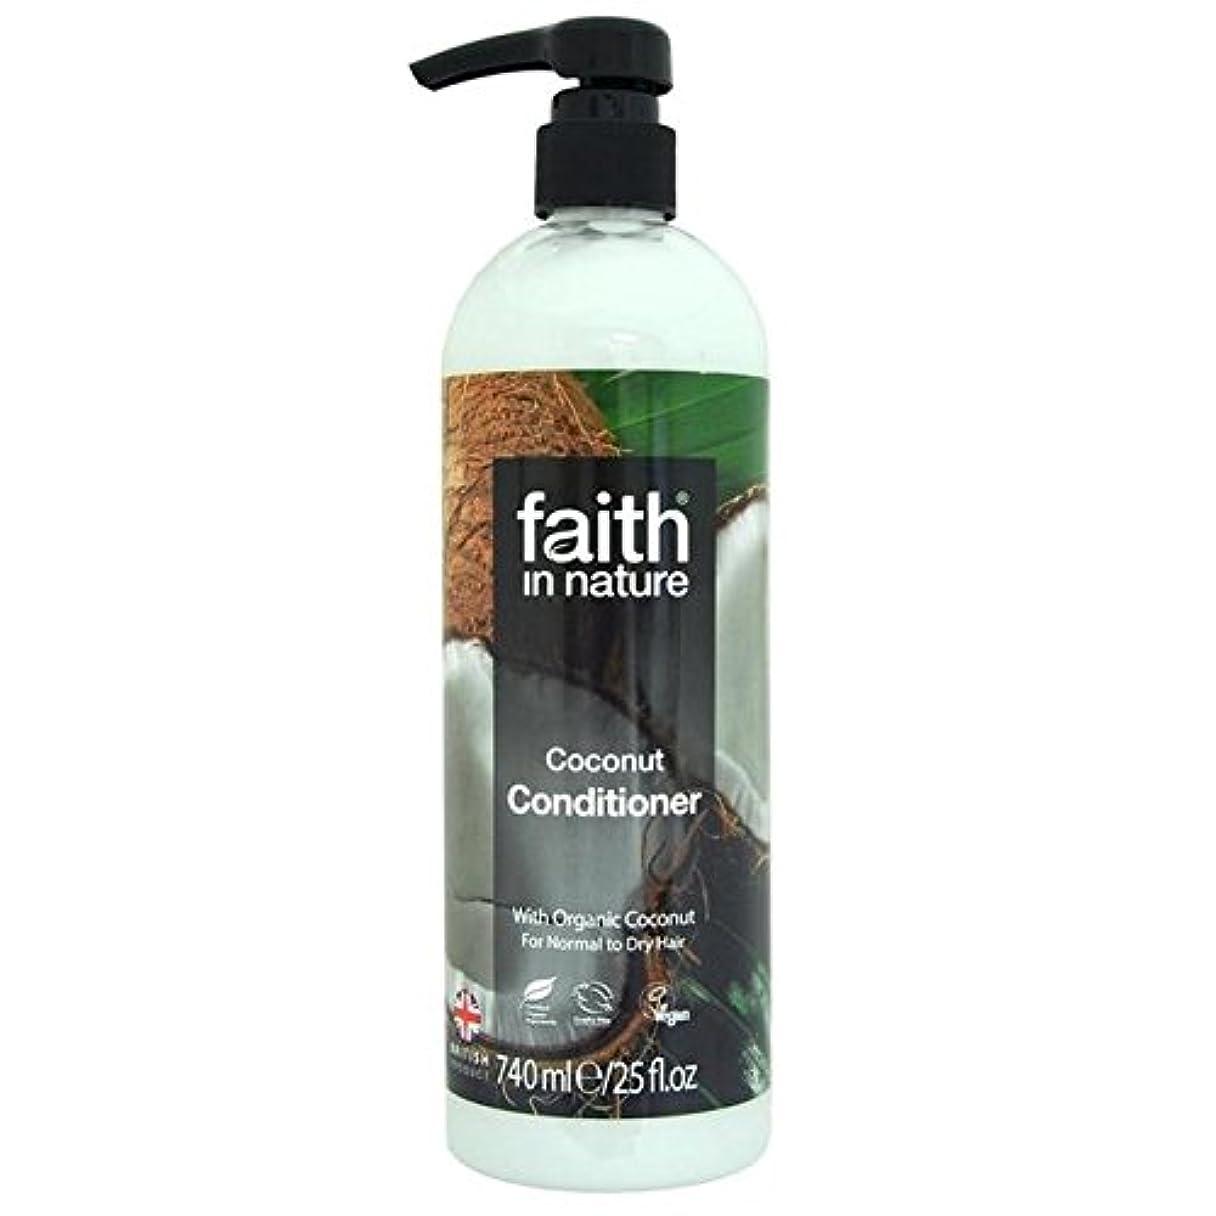 Faith in Nature Coconut Conditioner 740ml (Pack of 4) - (Faith In Nature) 自然ココナッツコンディショナー740ミリリットルの信仰 (x4) [並行輸入品]